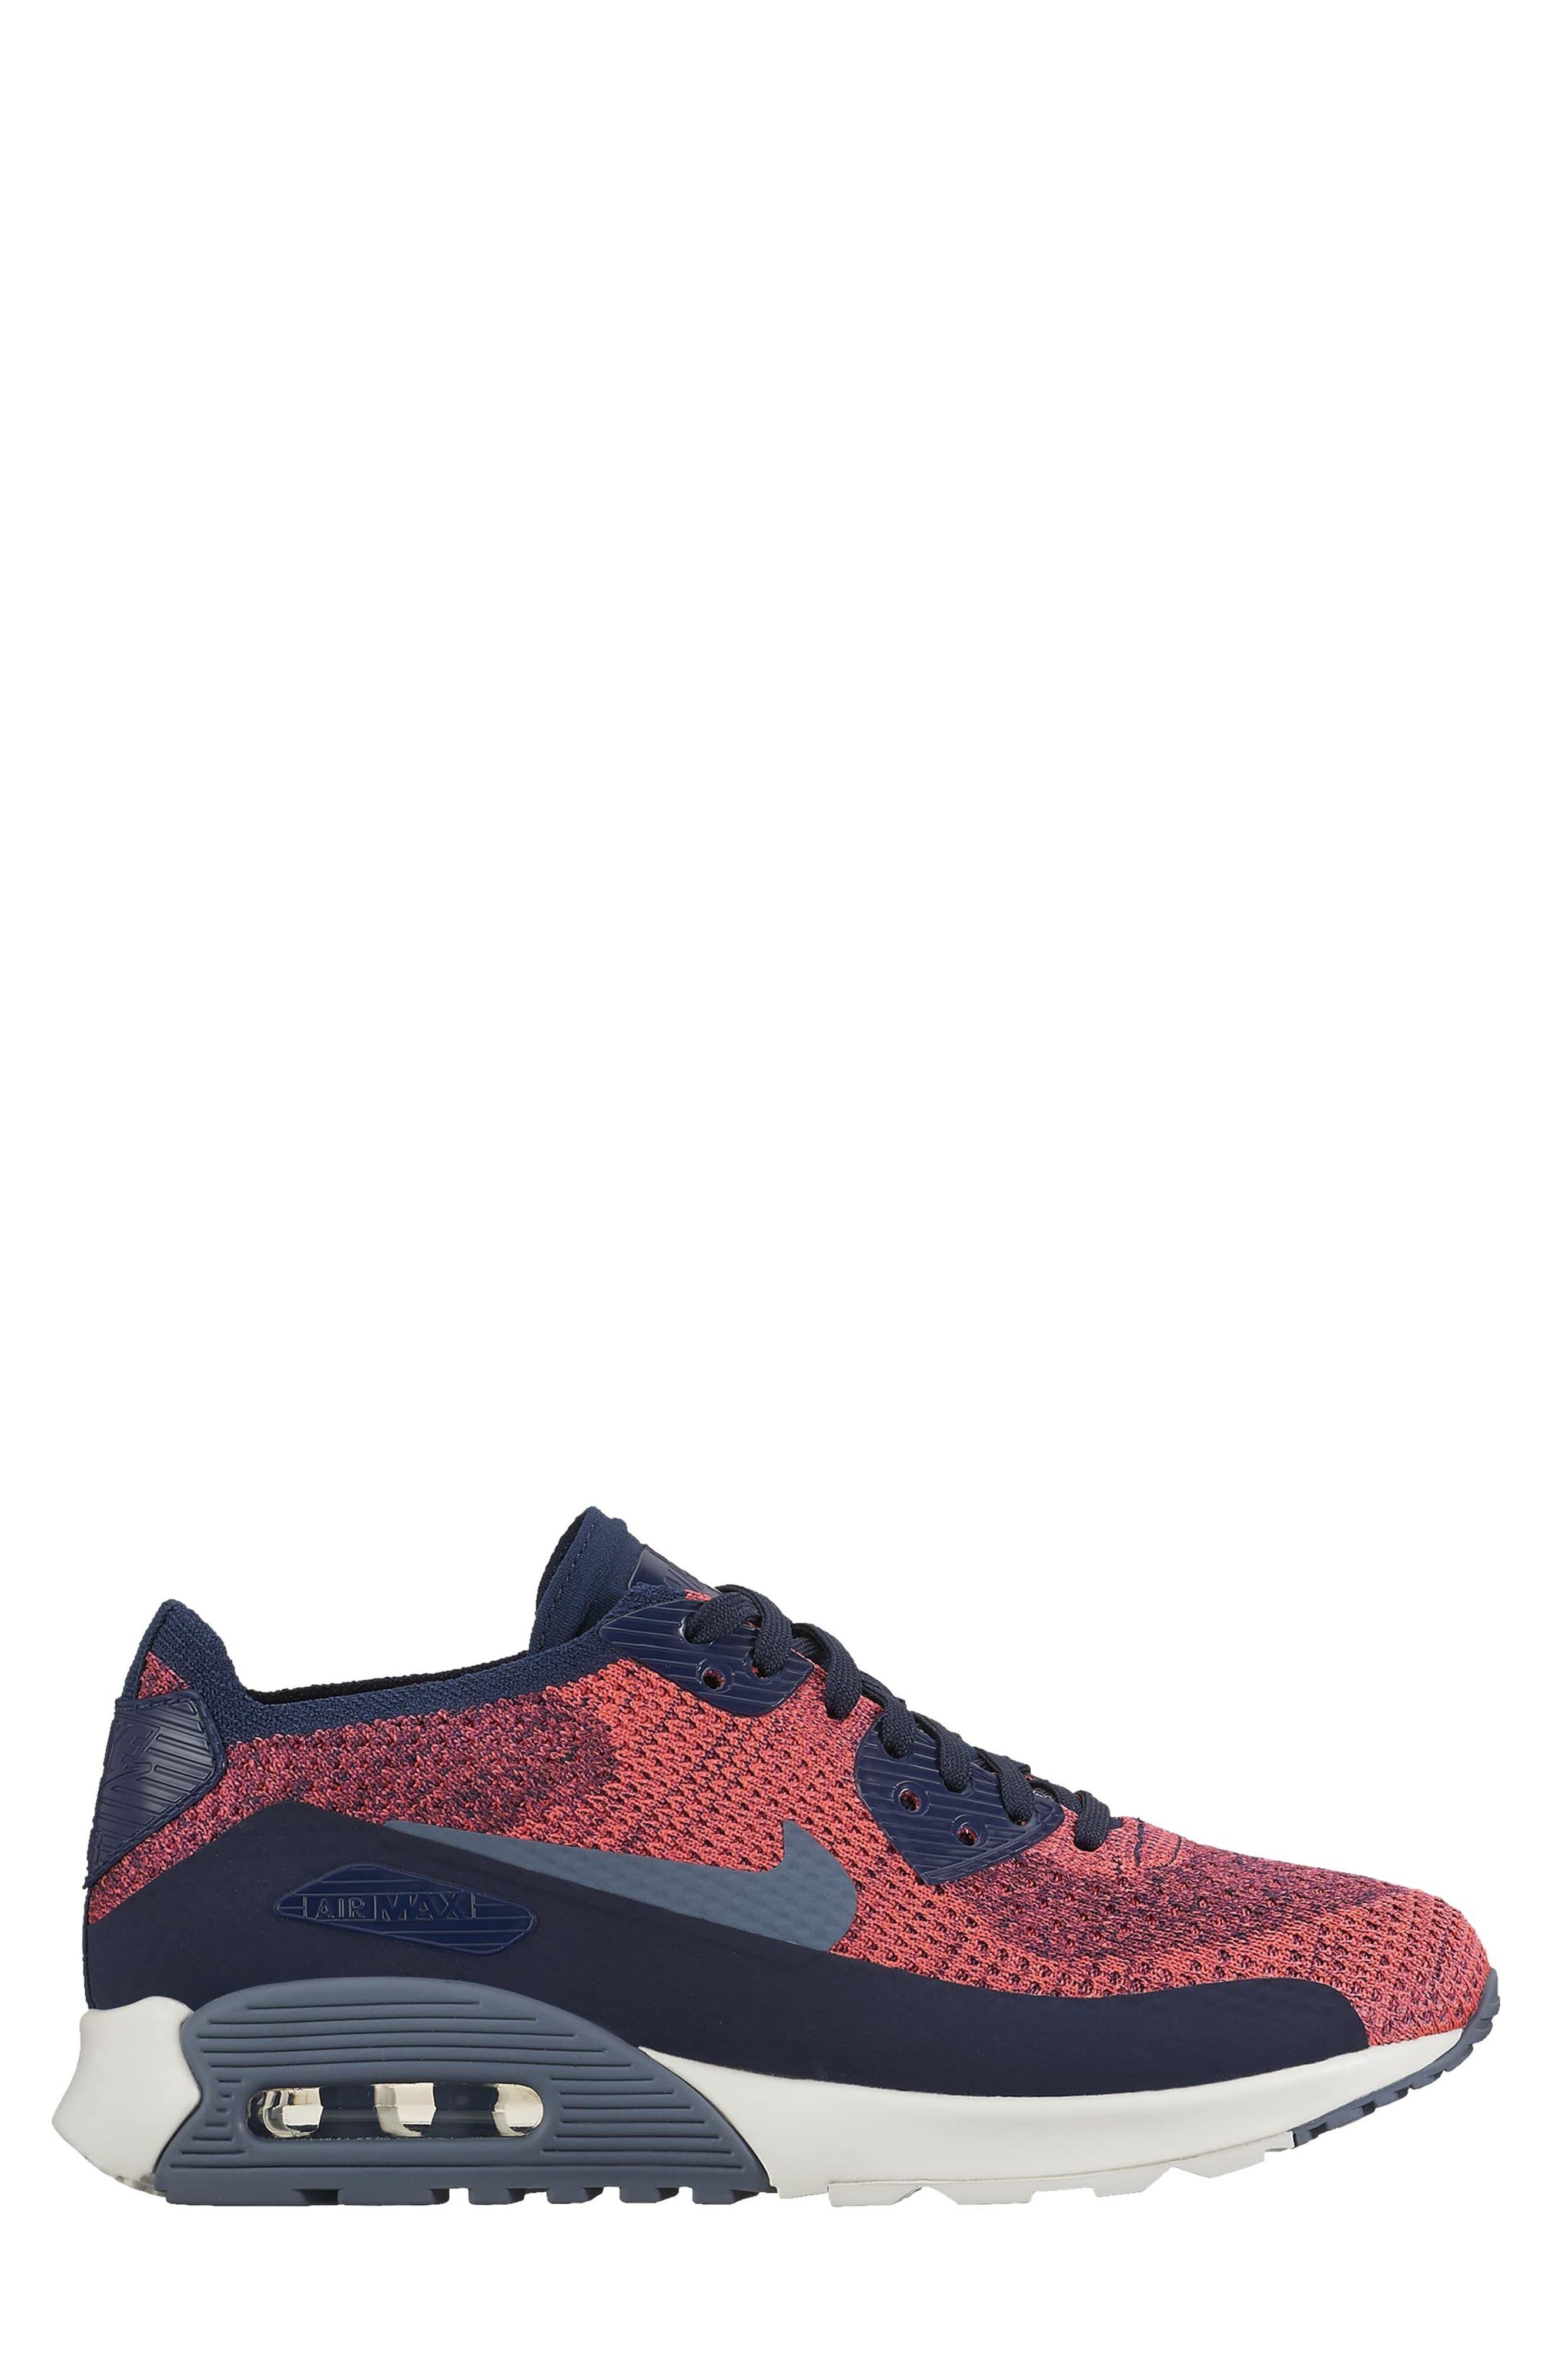 Air Max 90 Flyknit Ultra 2.0 Sneaker,                             Alternate thumbnail 9, color,